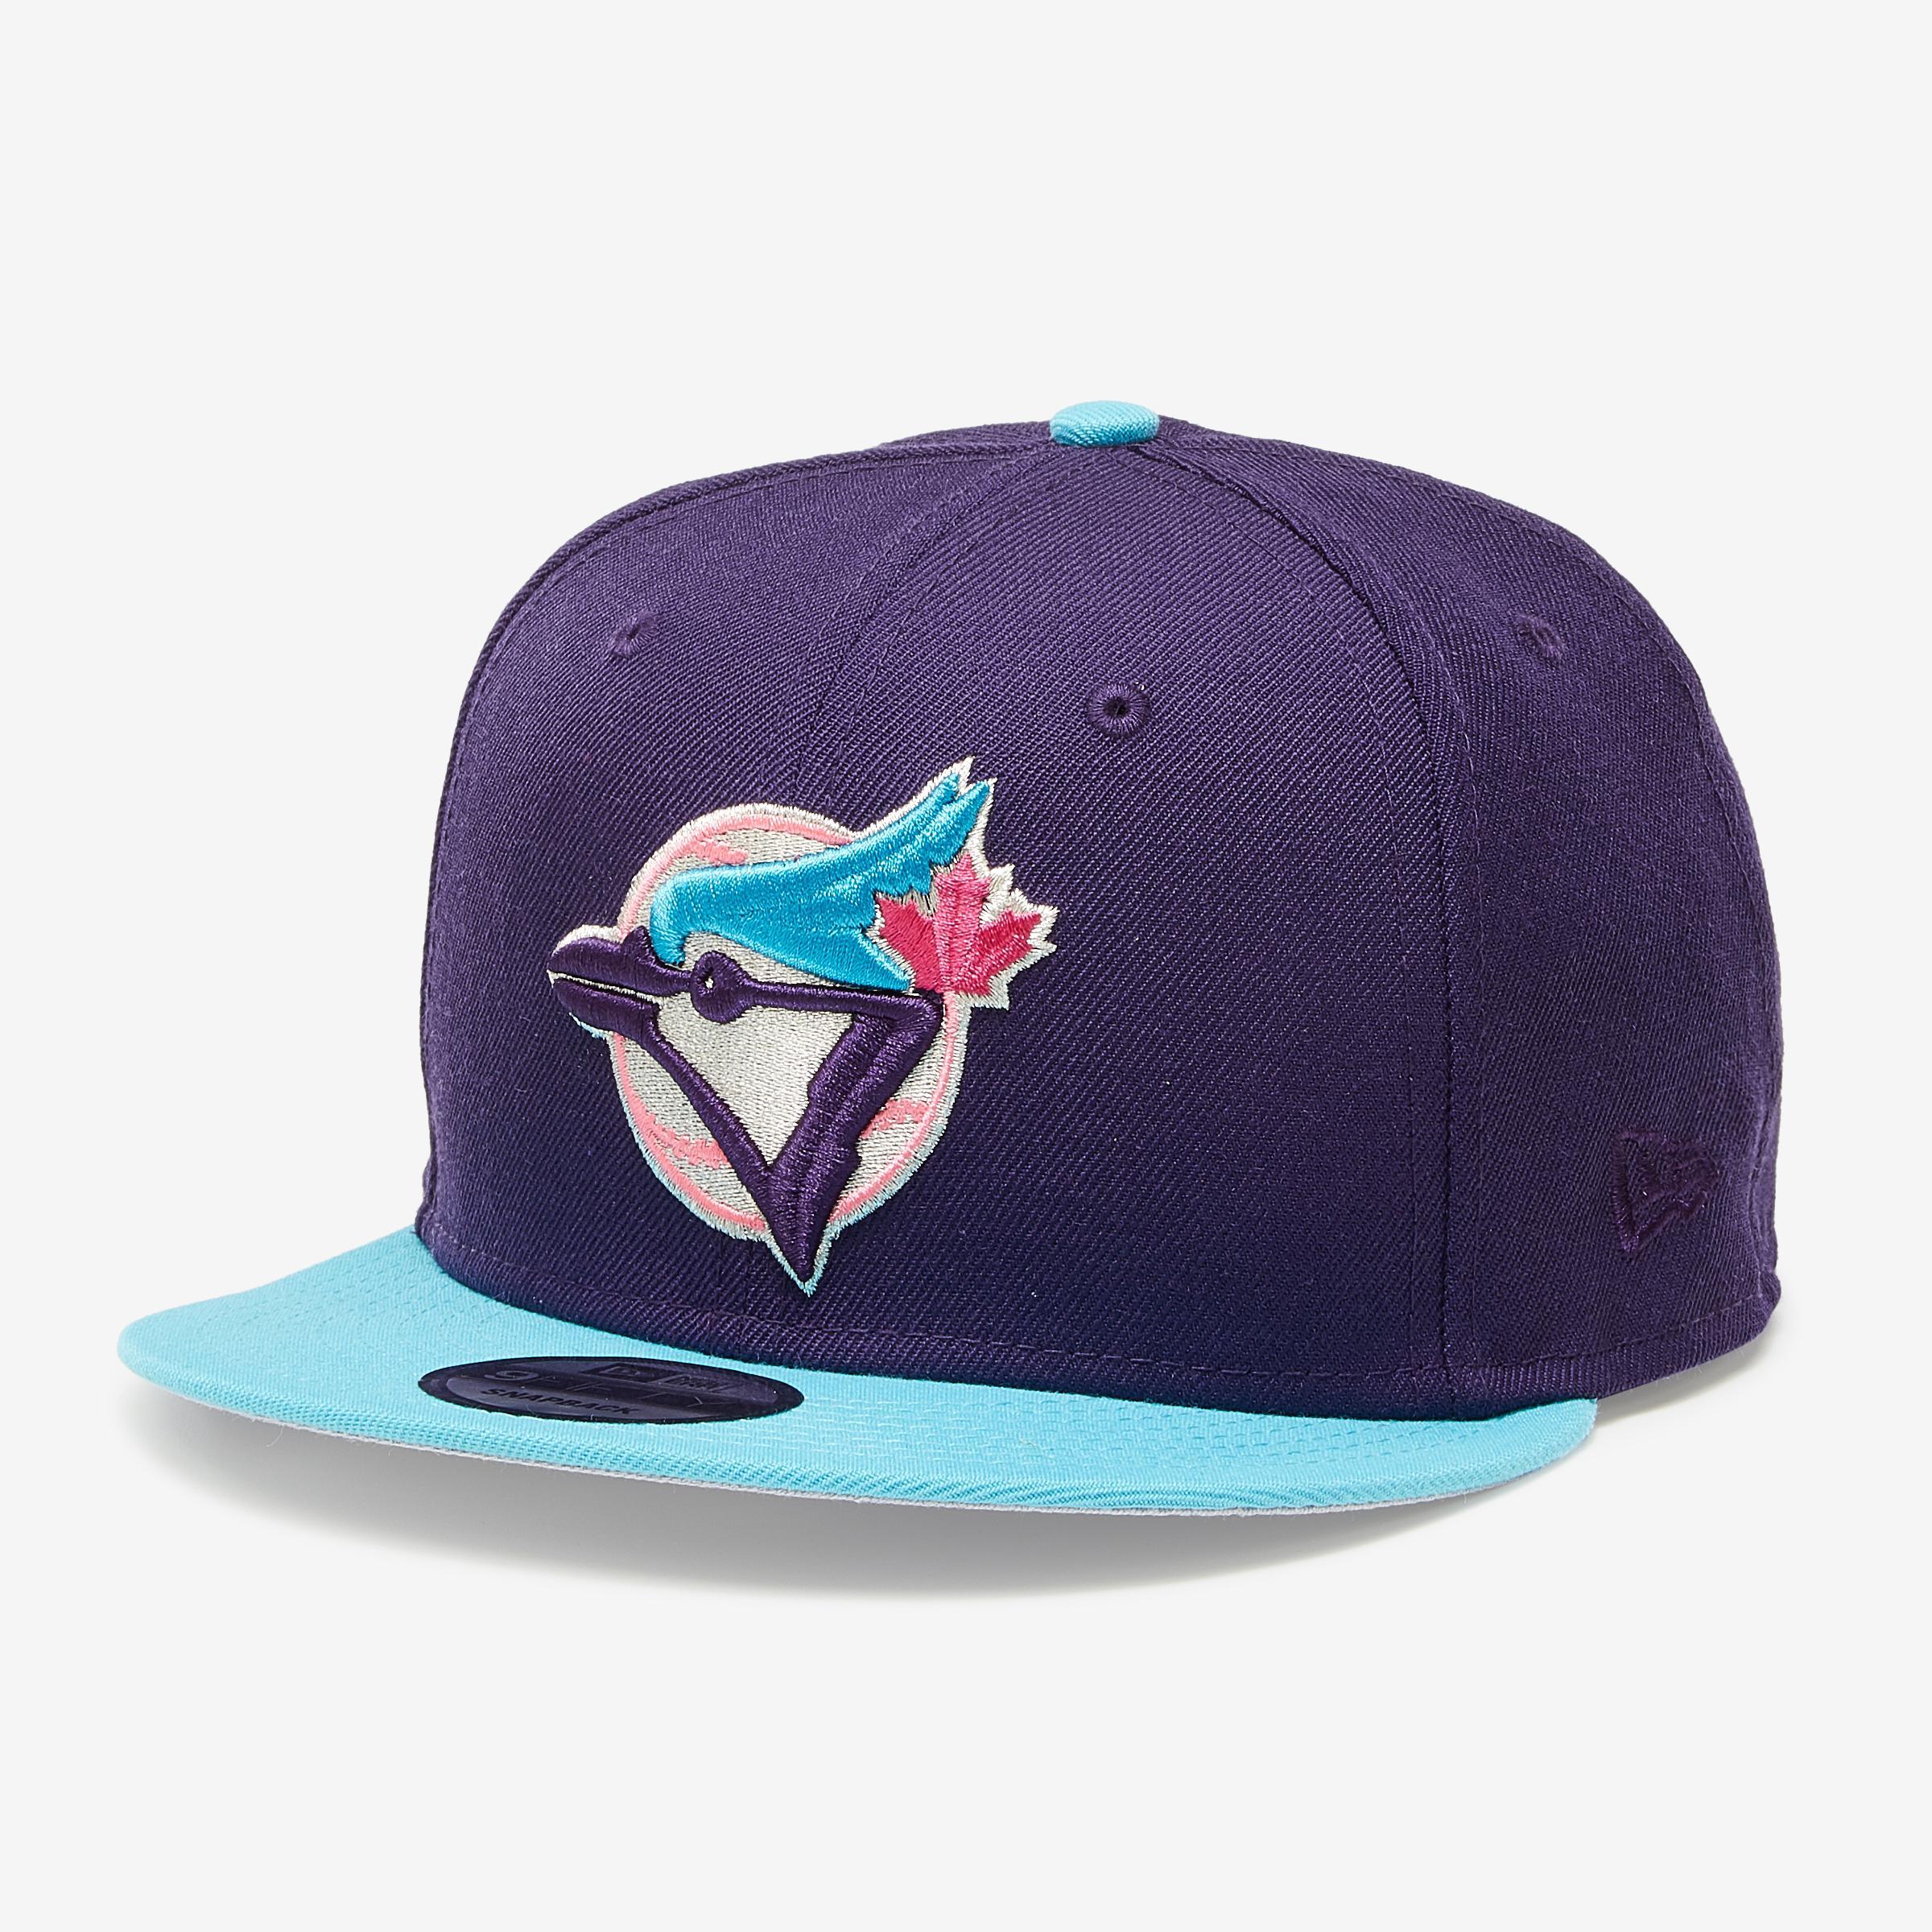 Blue Jays 9fifty Snapback